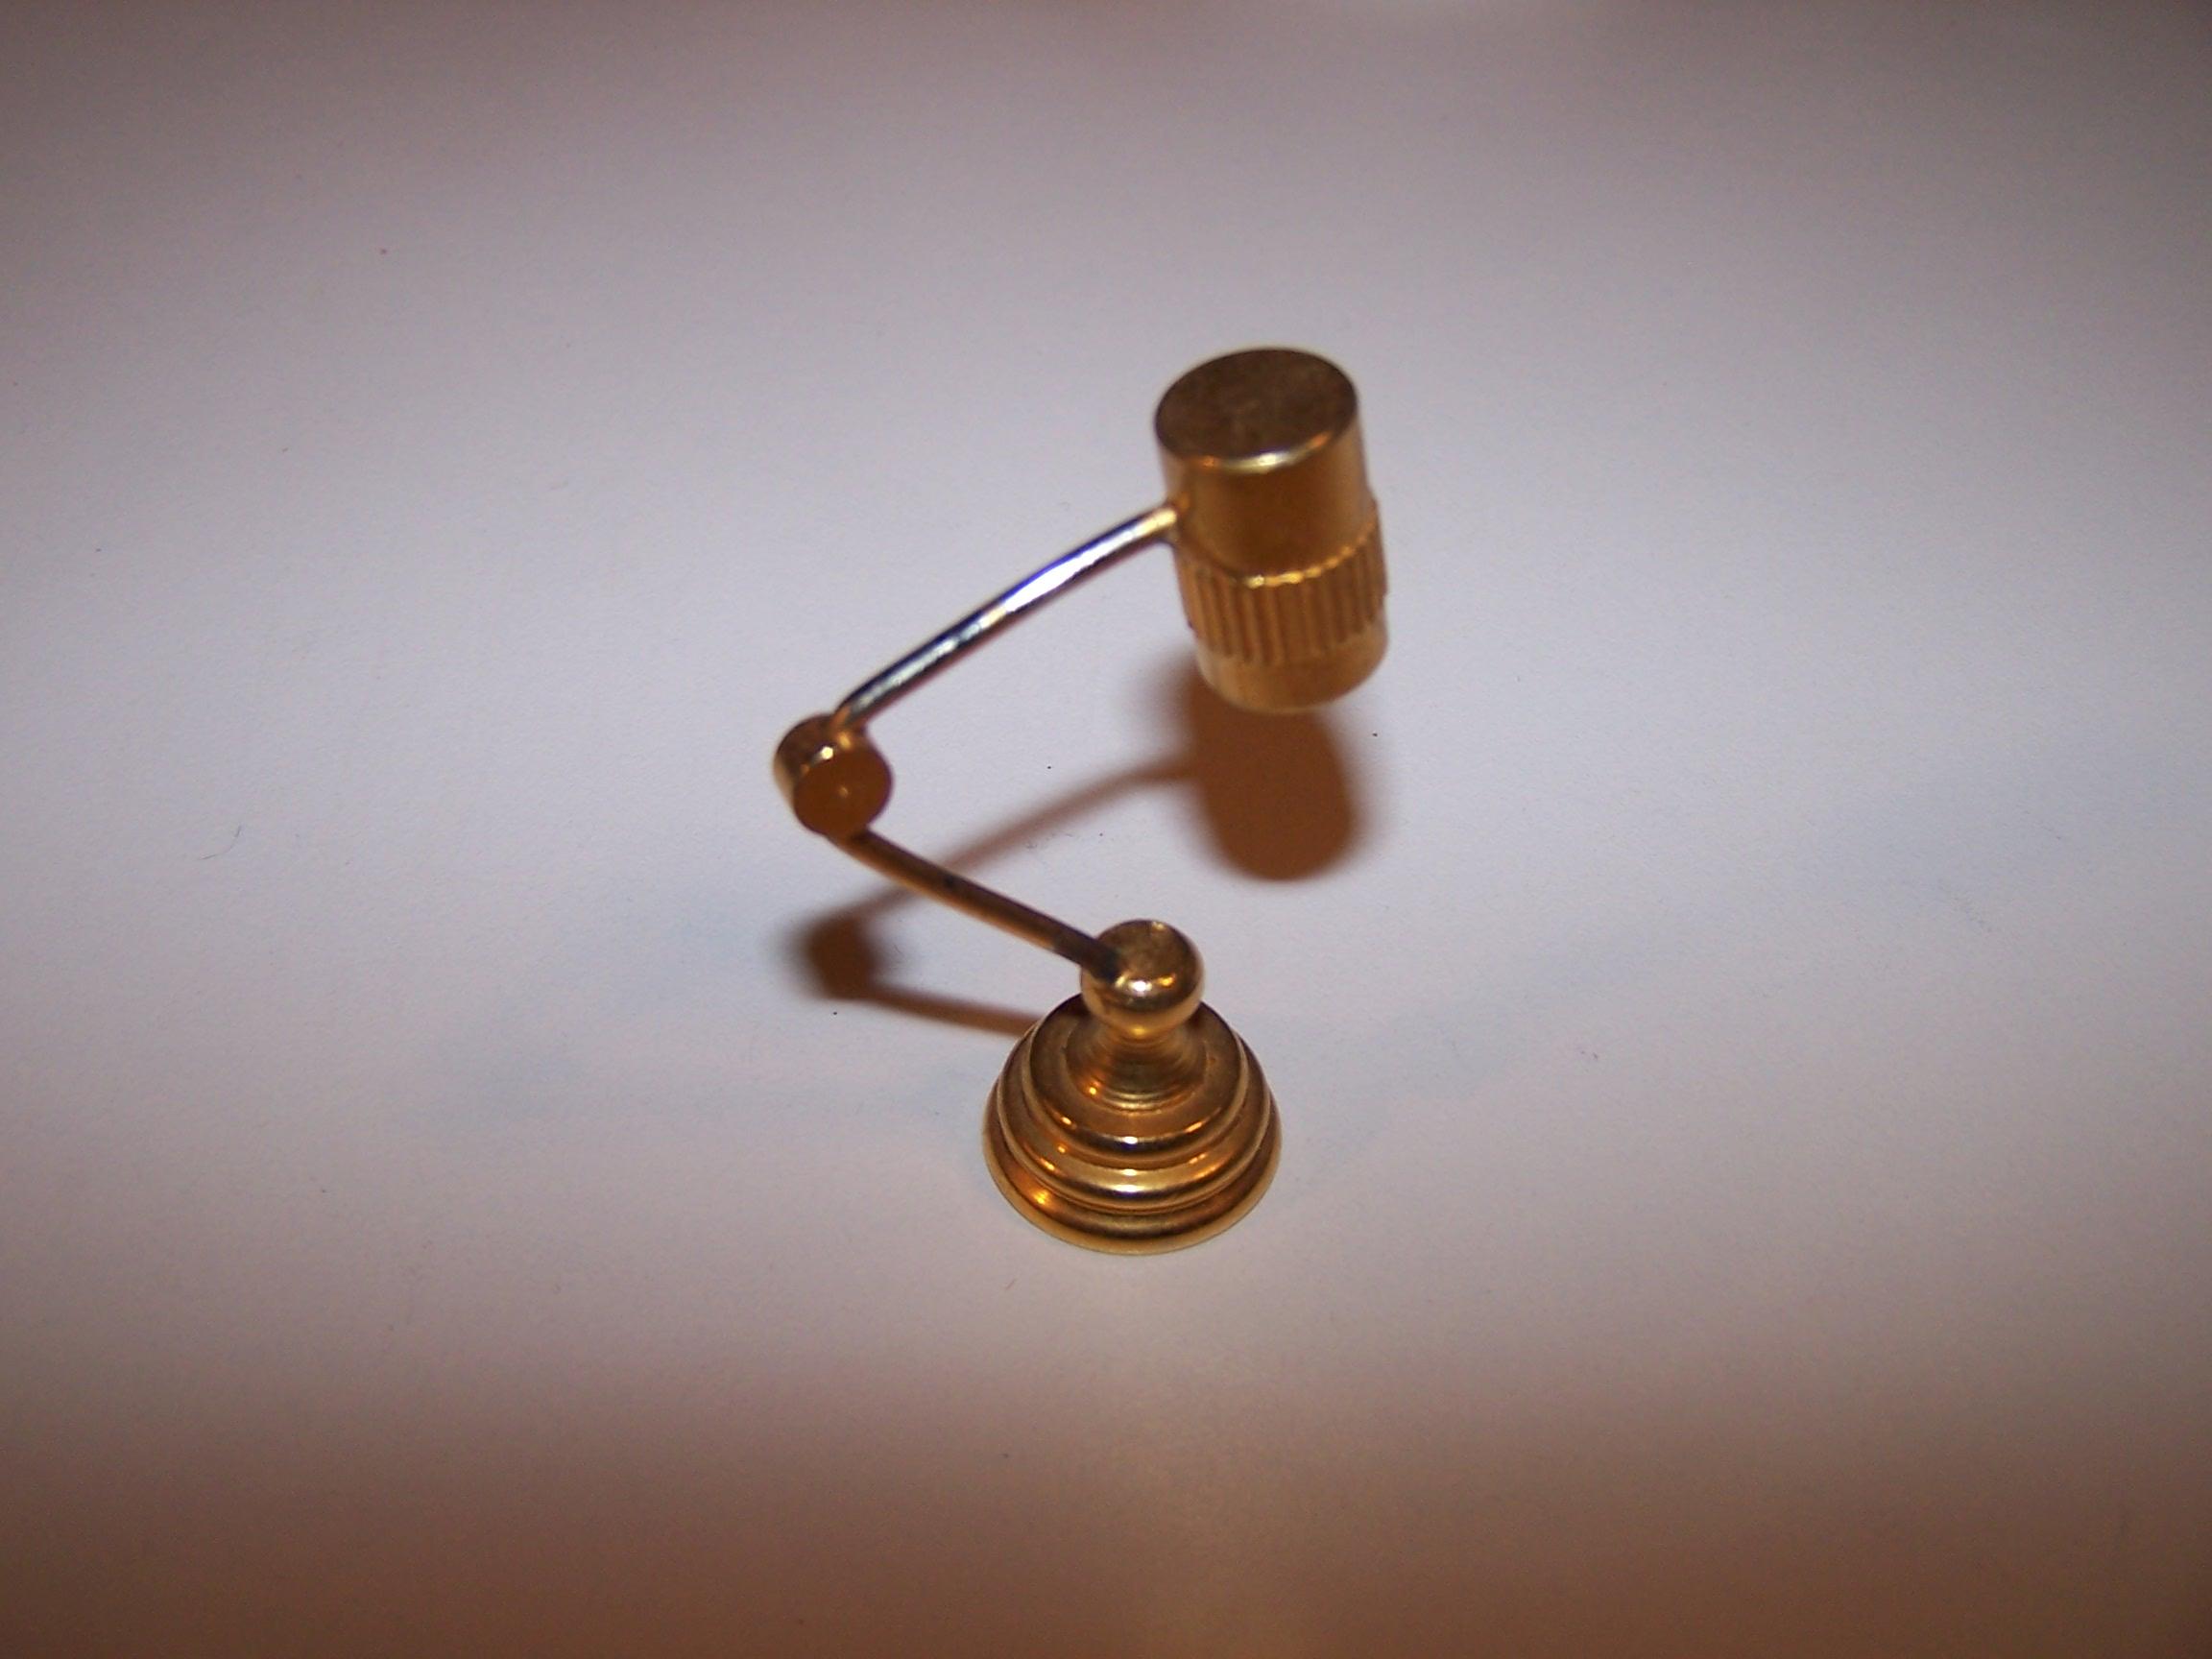 Image 2 of Dollhouse Brass Mod Desk Lamp, Miniature